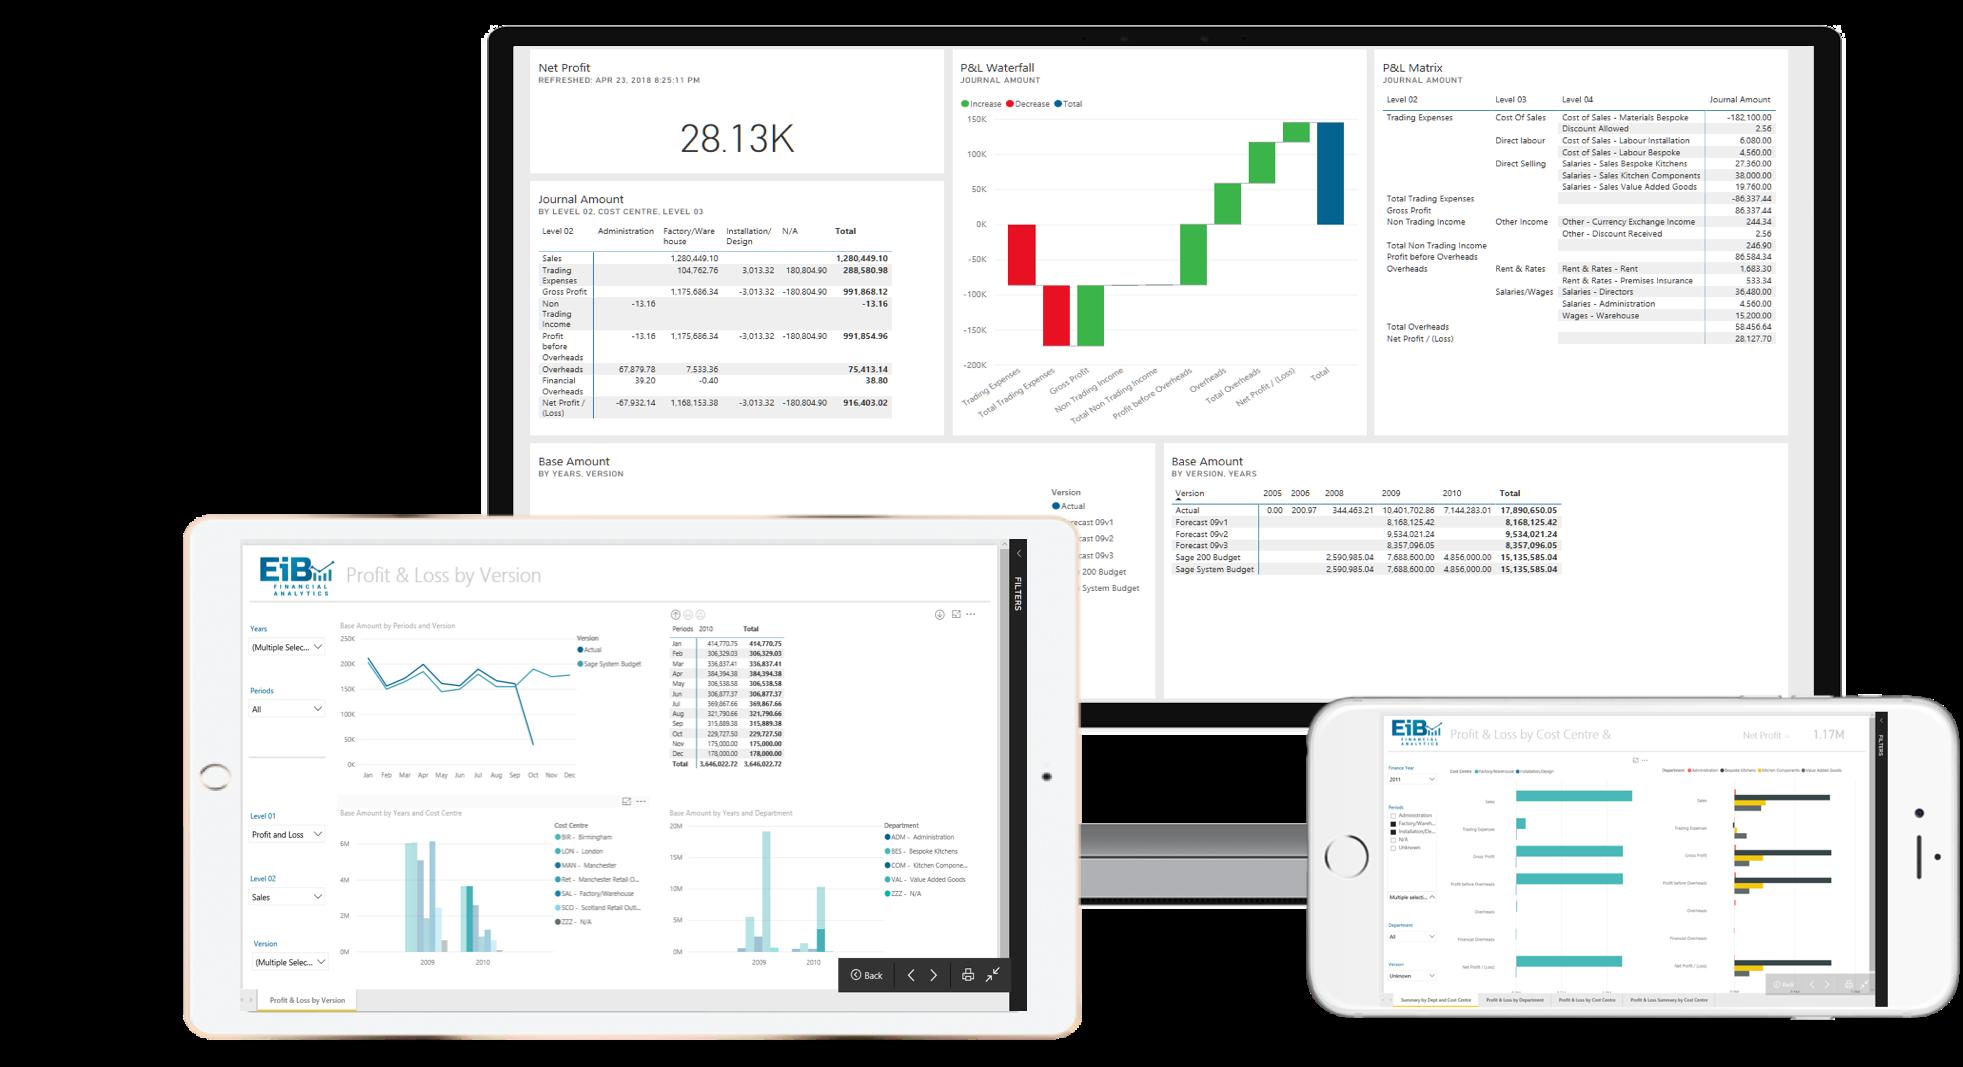 EiB Financial Analytics Web and Mobile Power BI Reports